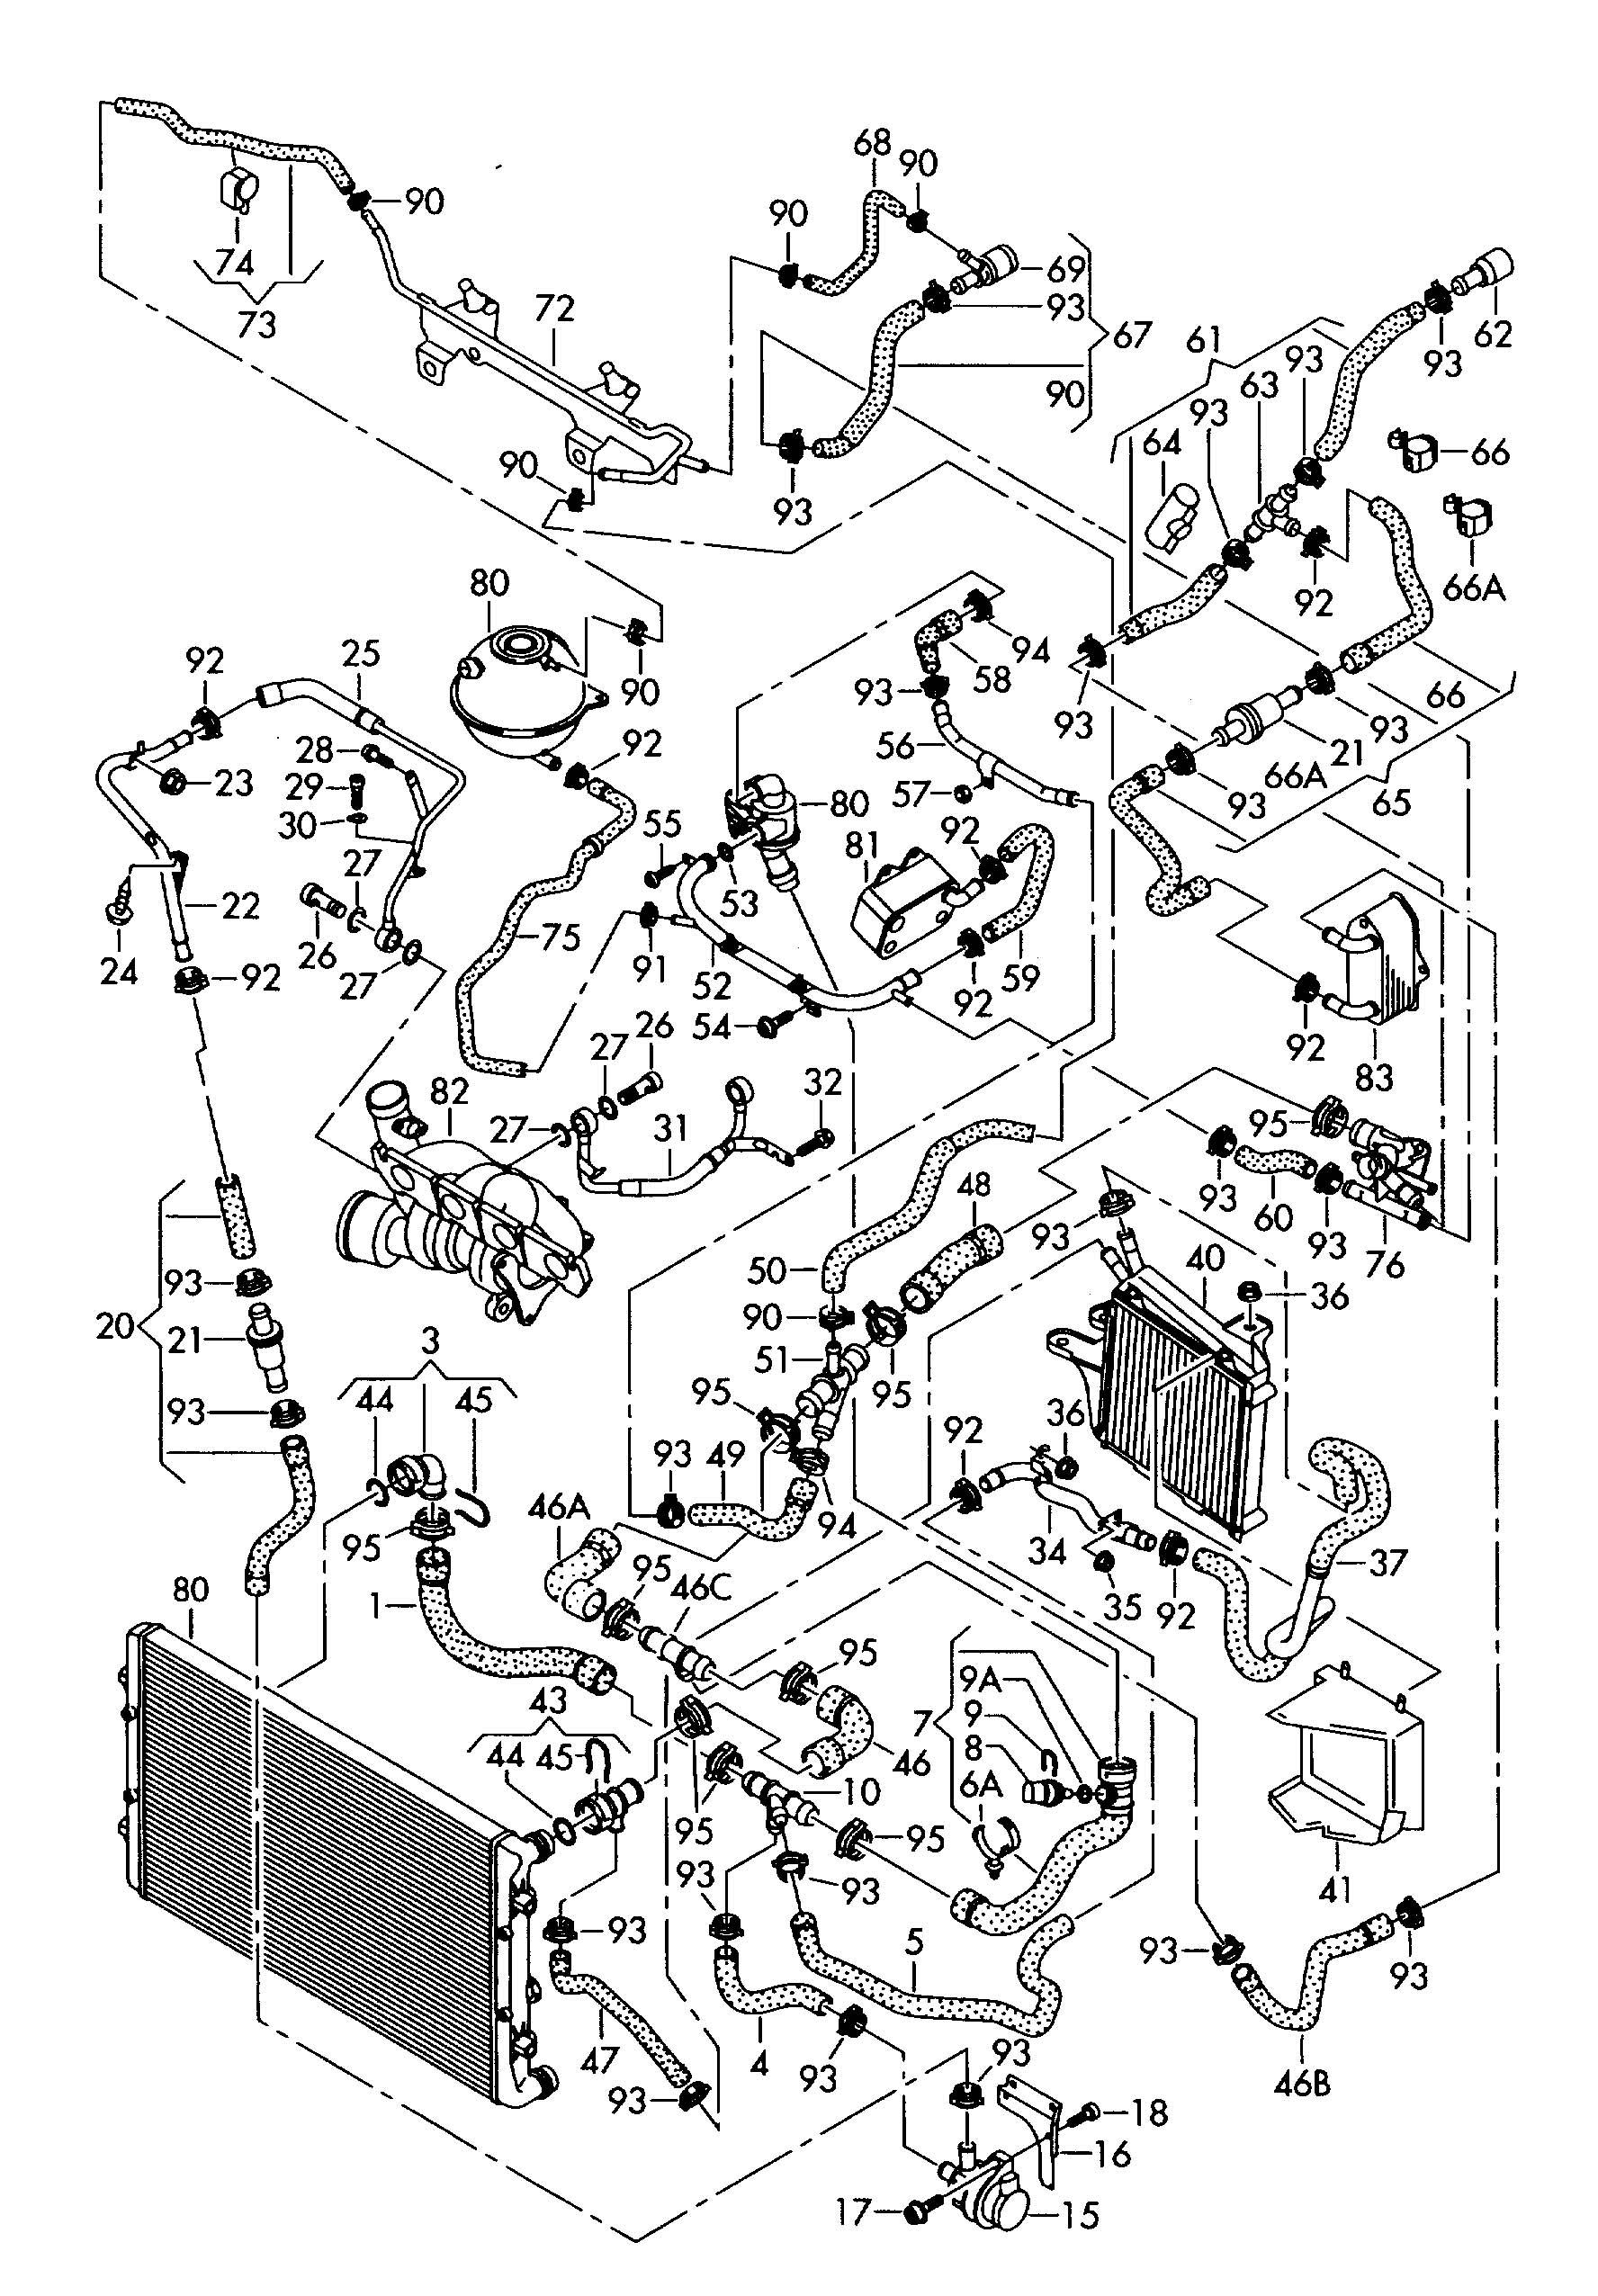 ZF_5417] 2010 Vw Gti Engine Diagram Free Diagram | Gti Engine Diagram S |  | Gious Dict Vira Mohammedshrine Librar Wiring 101